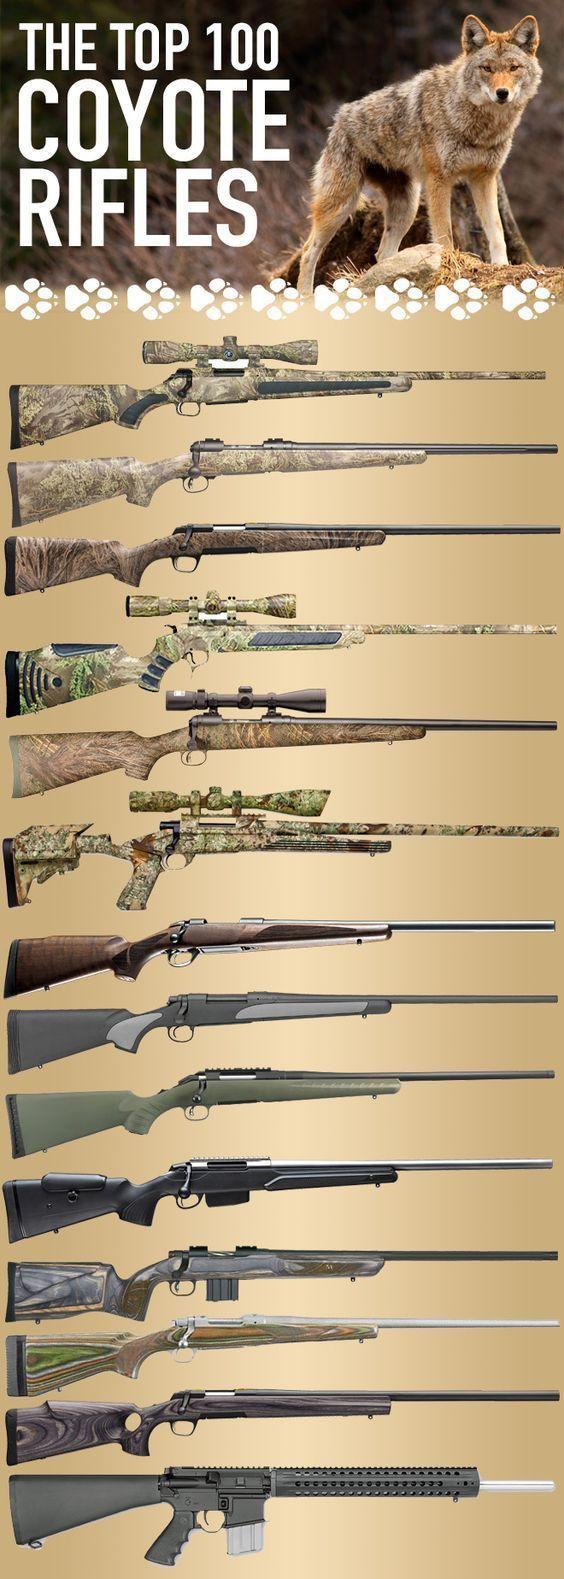 49 best Guns images on Pinterest | Snipers, Hand guns and Sniper ...